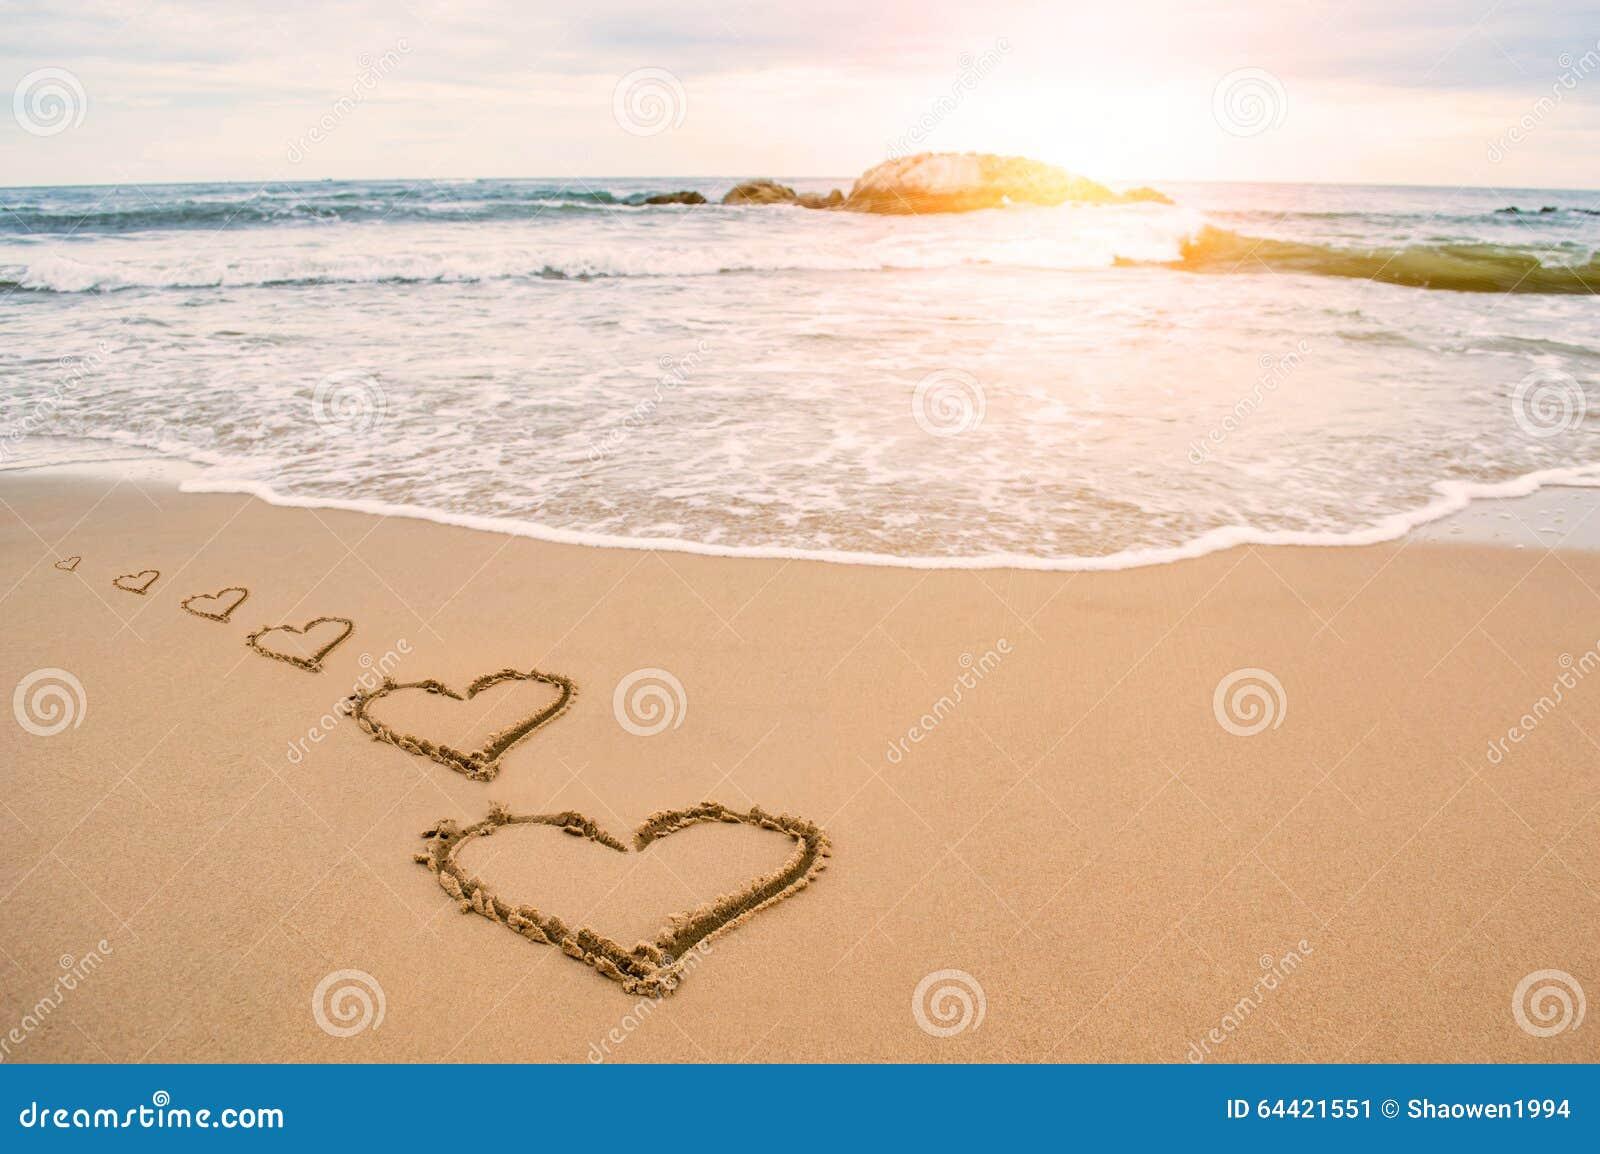 Download Love heart romantic beach stock image. Image of written - 64421551